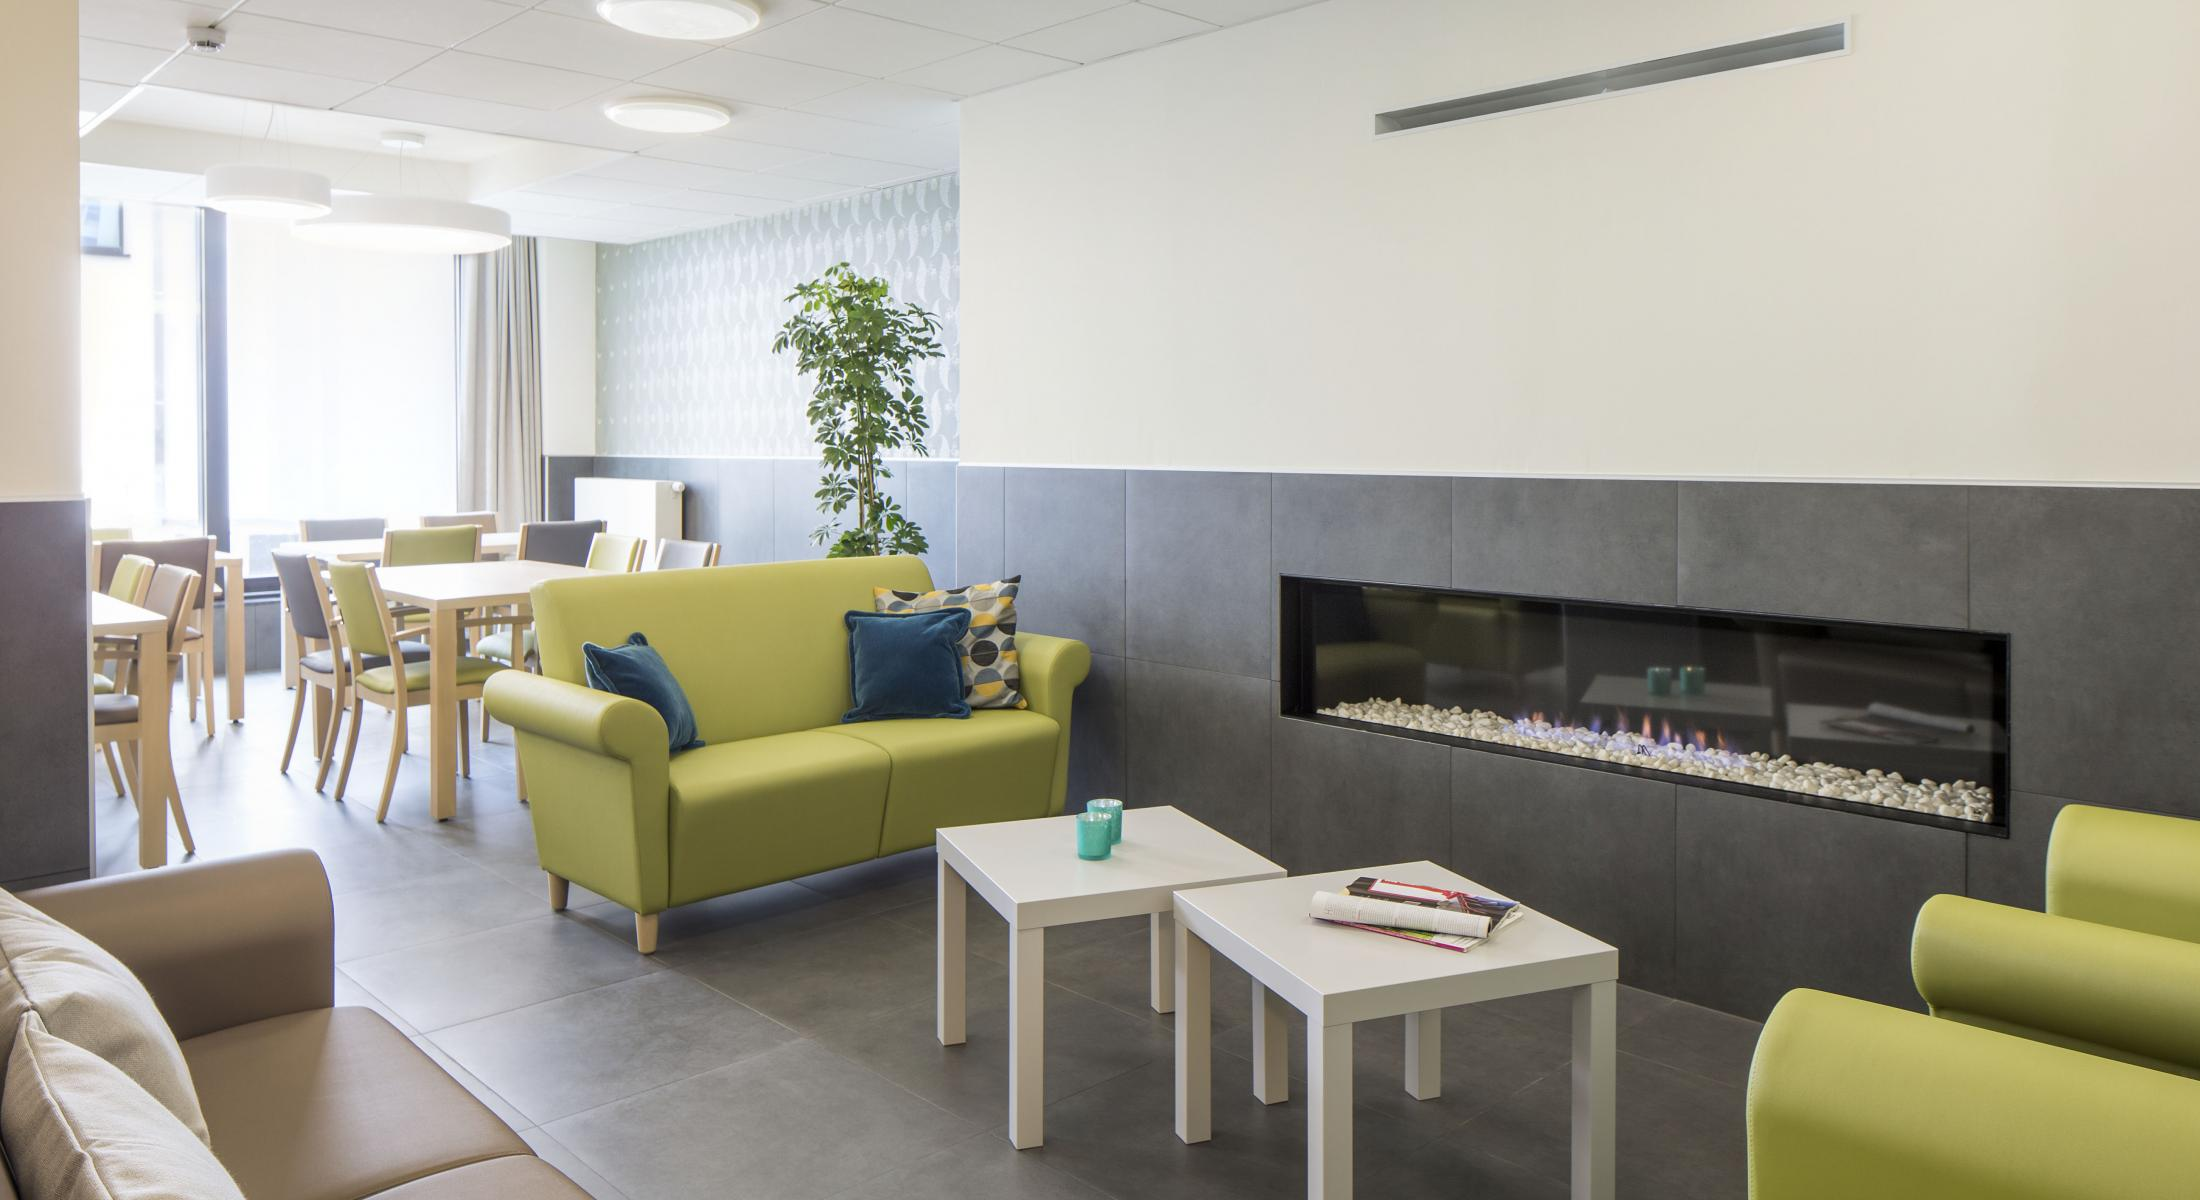 Creating Hospitality - Stephenson Garden 5 - moments furniture